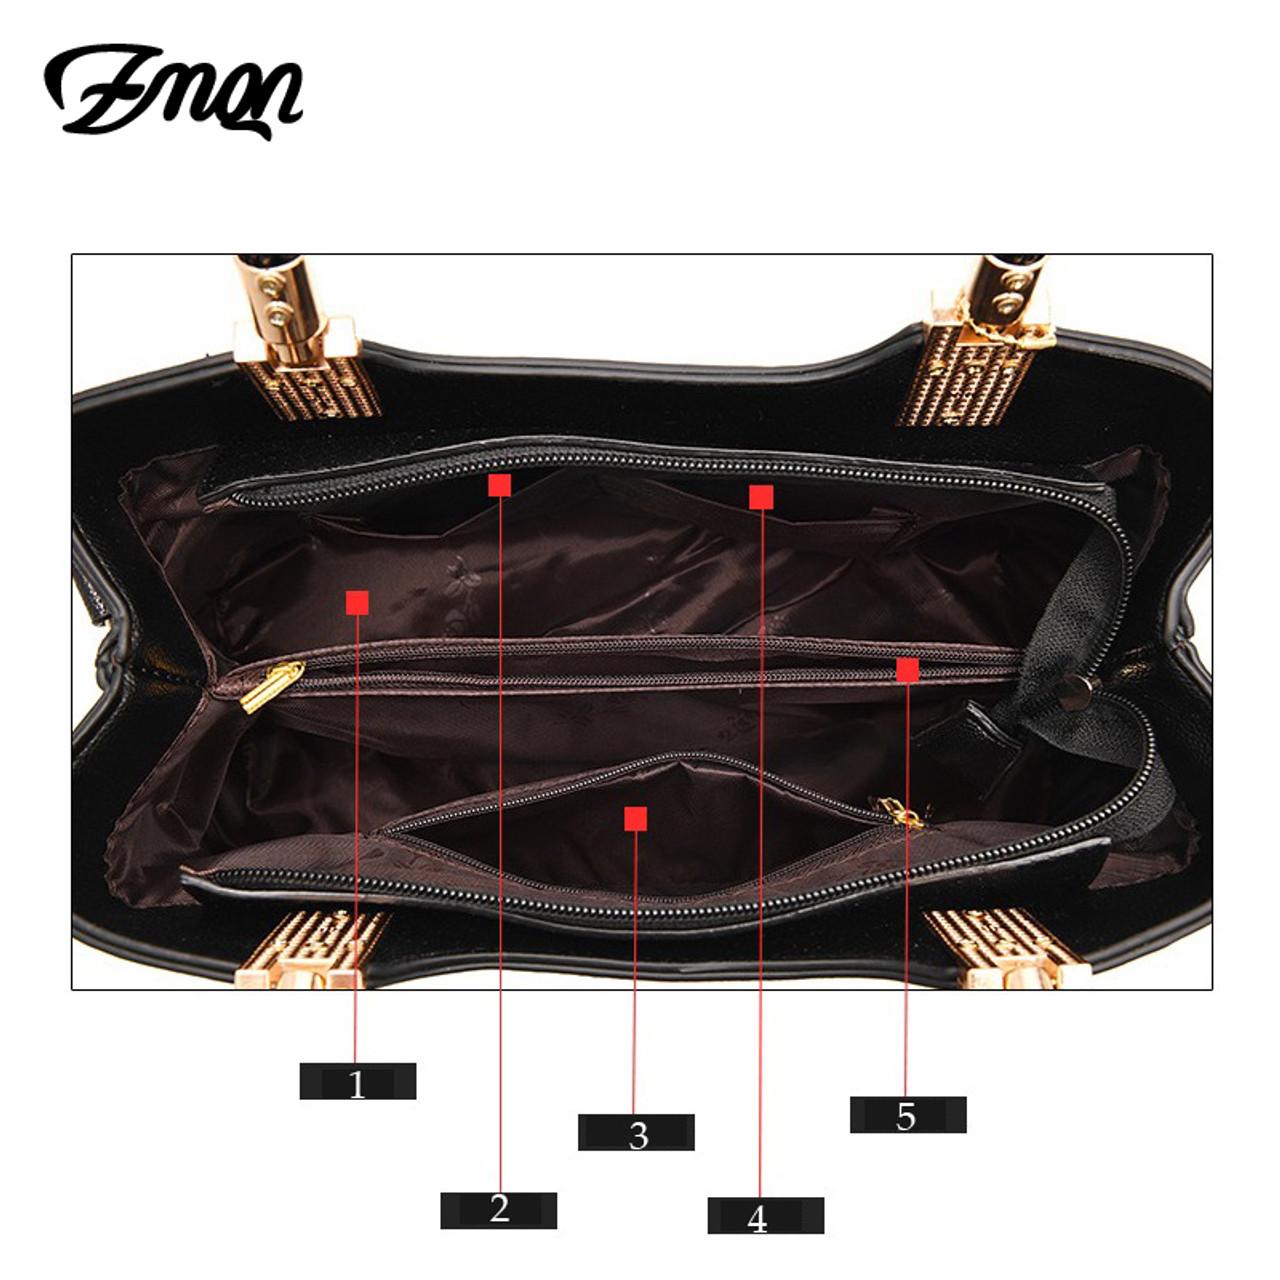 6cd4ddd2358 ZMQN Luxury Handbags Women Bags Designer Ladies Solid Shoulder Bag For  Women PU Leather Tassel Embroidery Handbags Kabelka B748